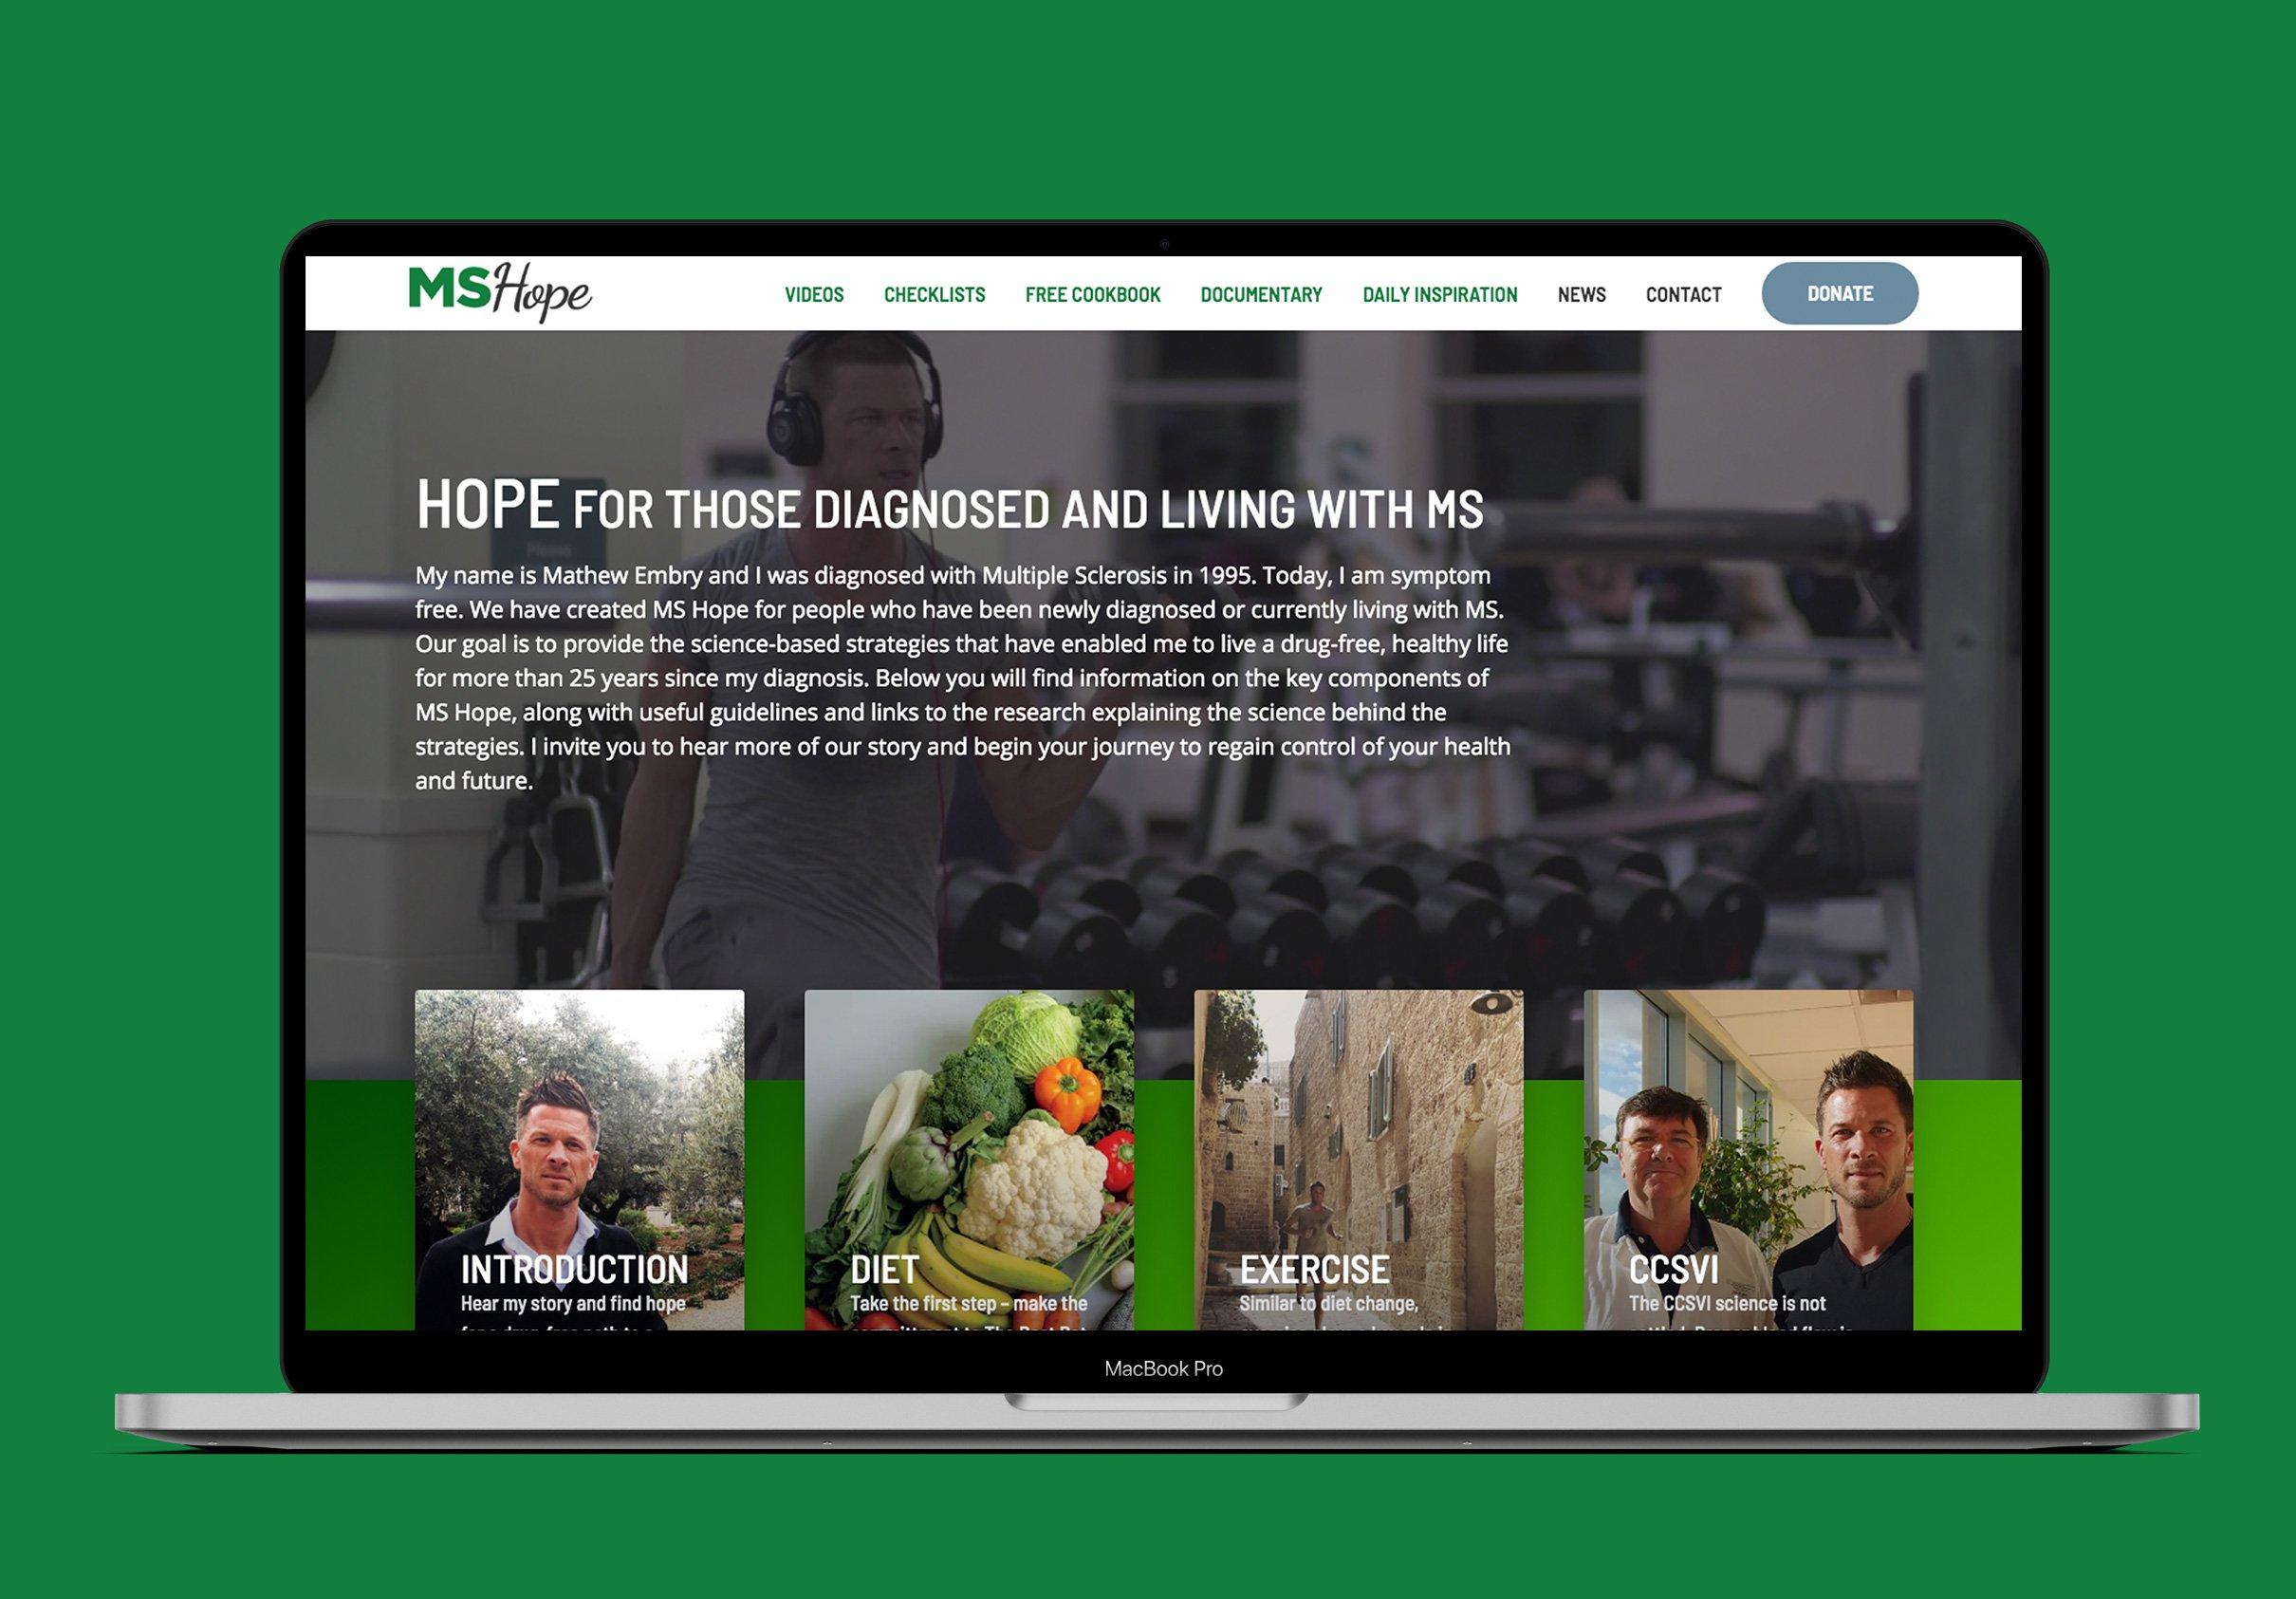 MS HOPE - BRAND IDENTITY & WEBSITE